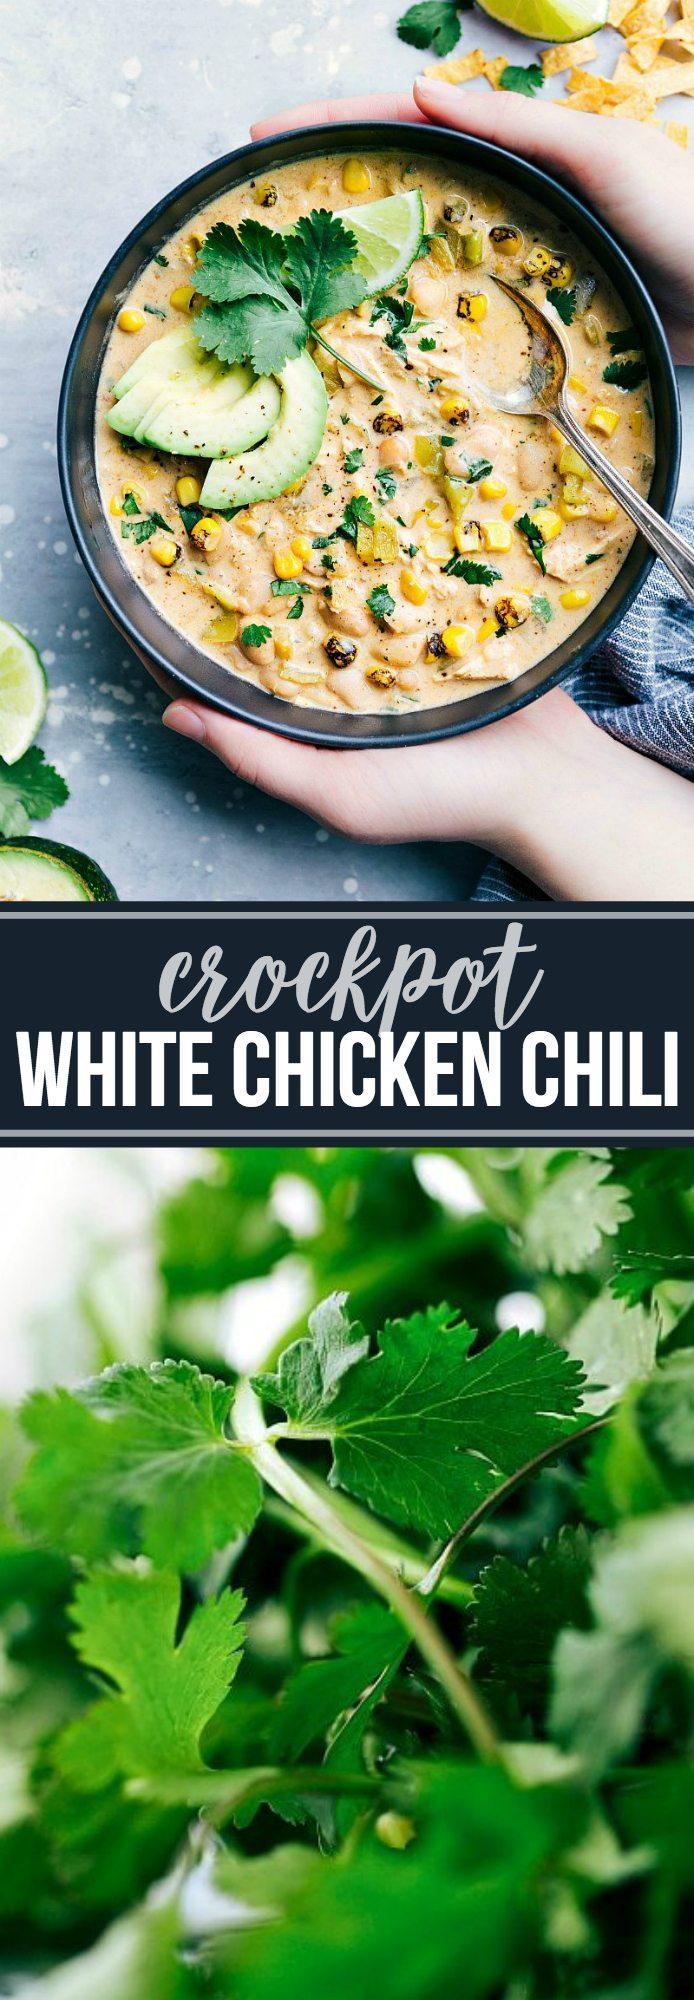 CrockPot White Chicken Chili {Secret Ingredient!}   Chelsea's Messy Apron